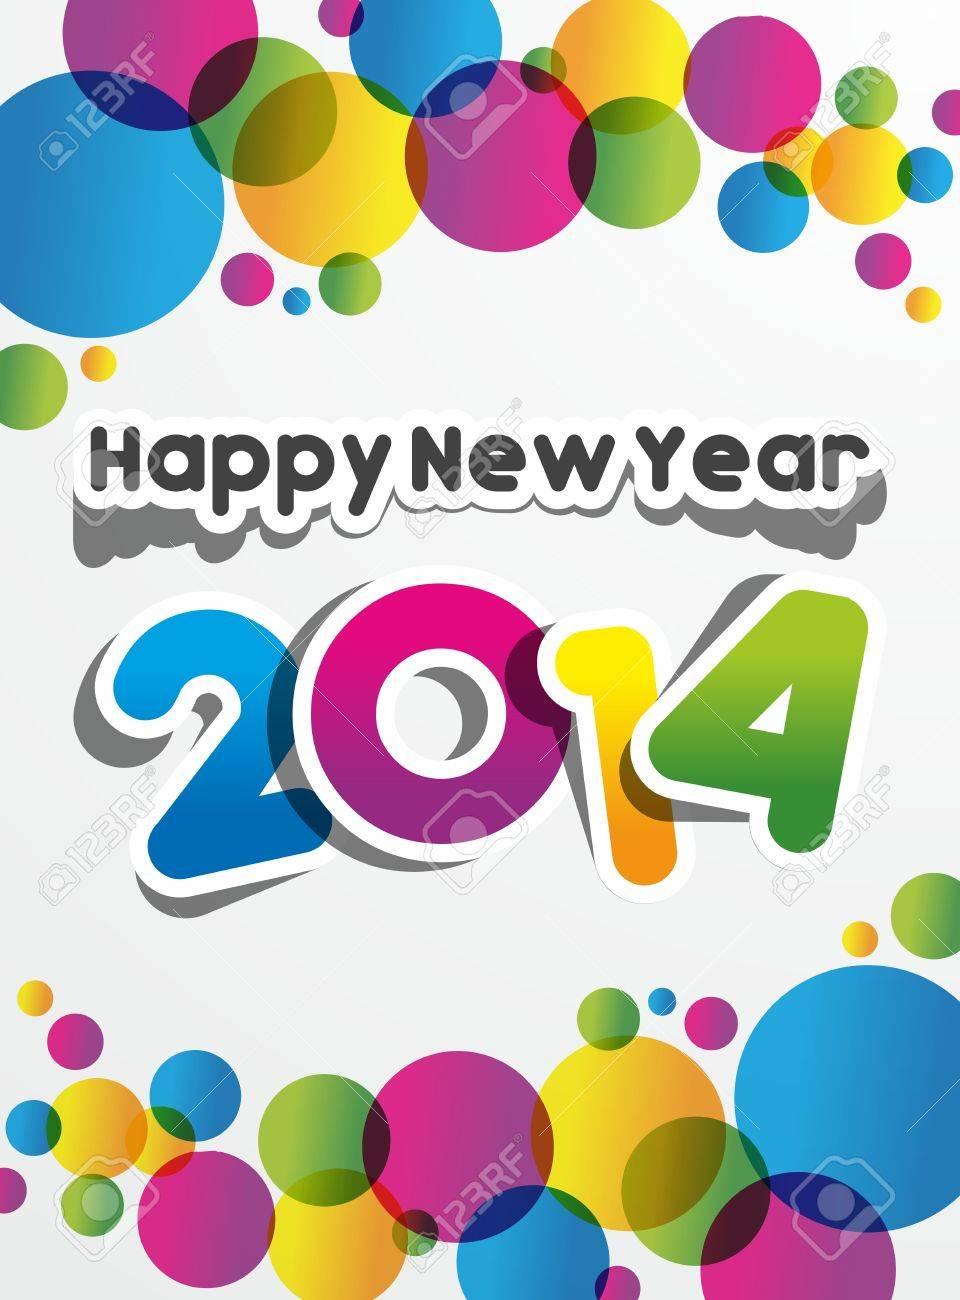 Happy New Year 2014 vector illustration Stock Vector - 22920403